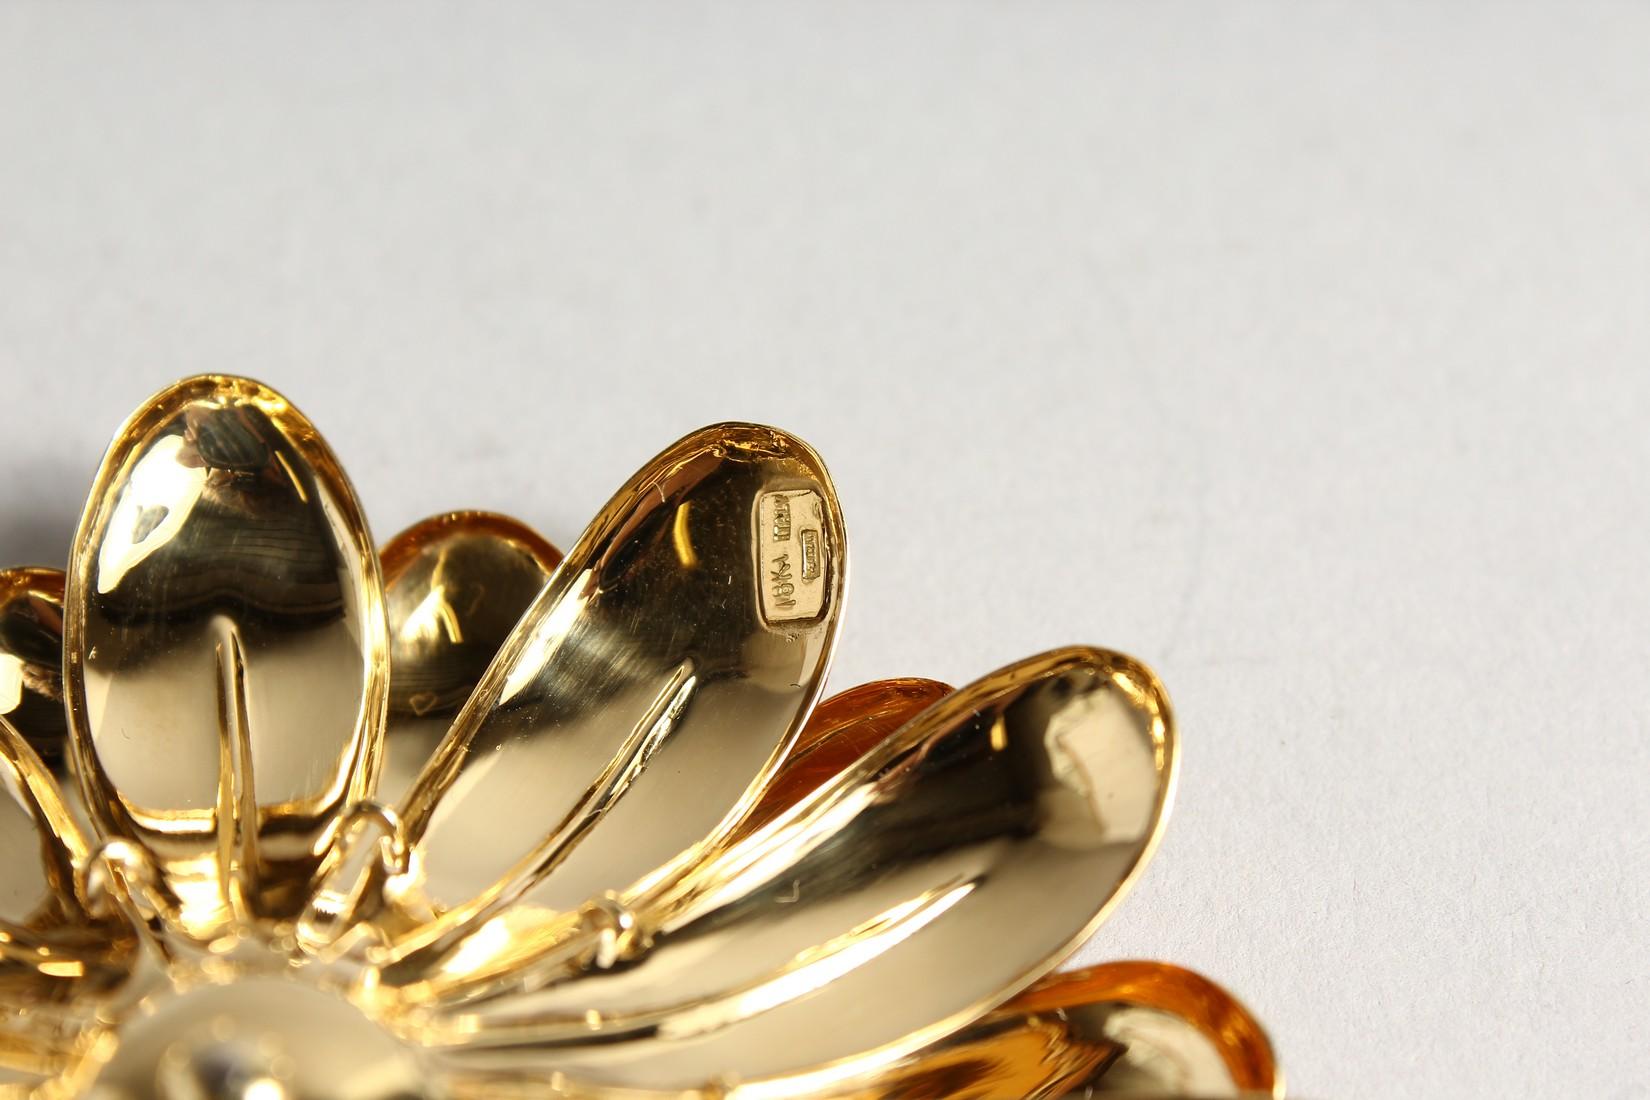 A SUPERB 18CT GOLD FLOWER BROOCH 7cm diameter, with P set diamond centre. 48gms - Image 3 of 3